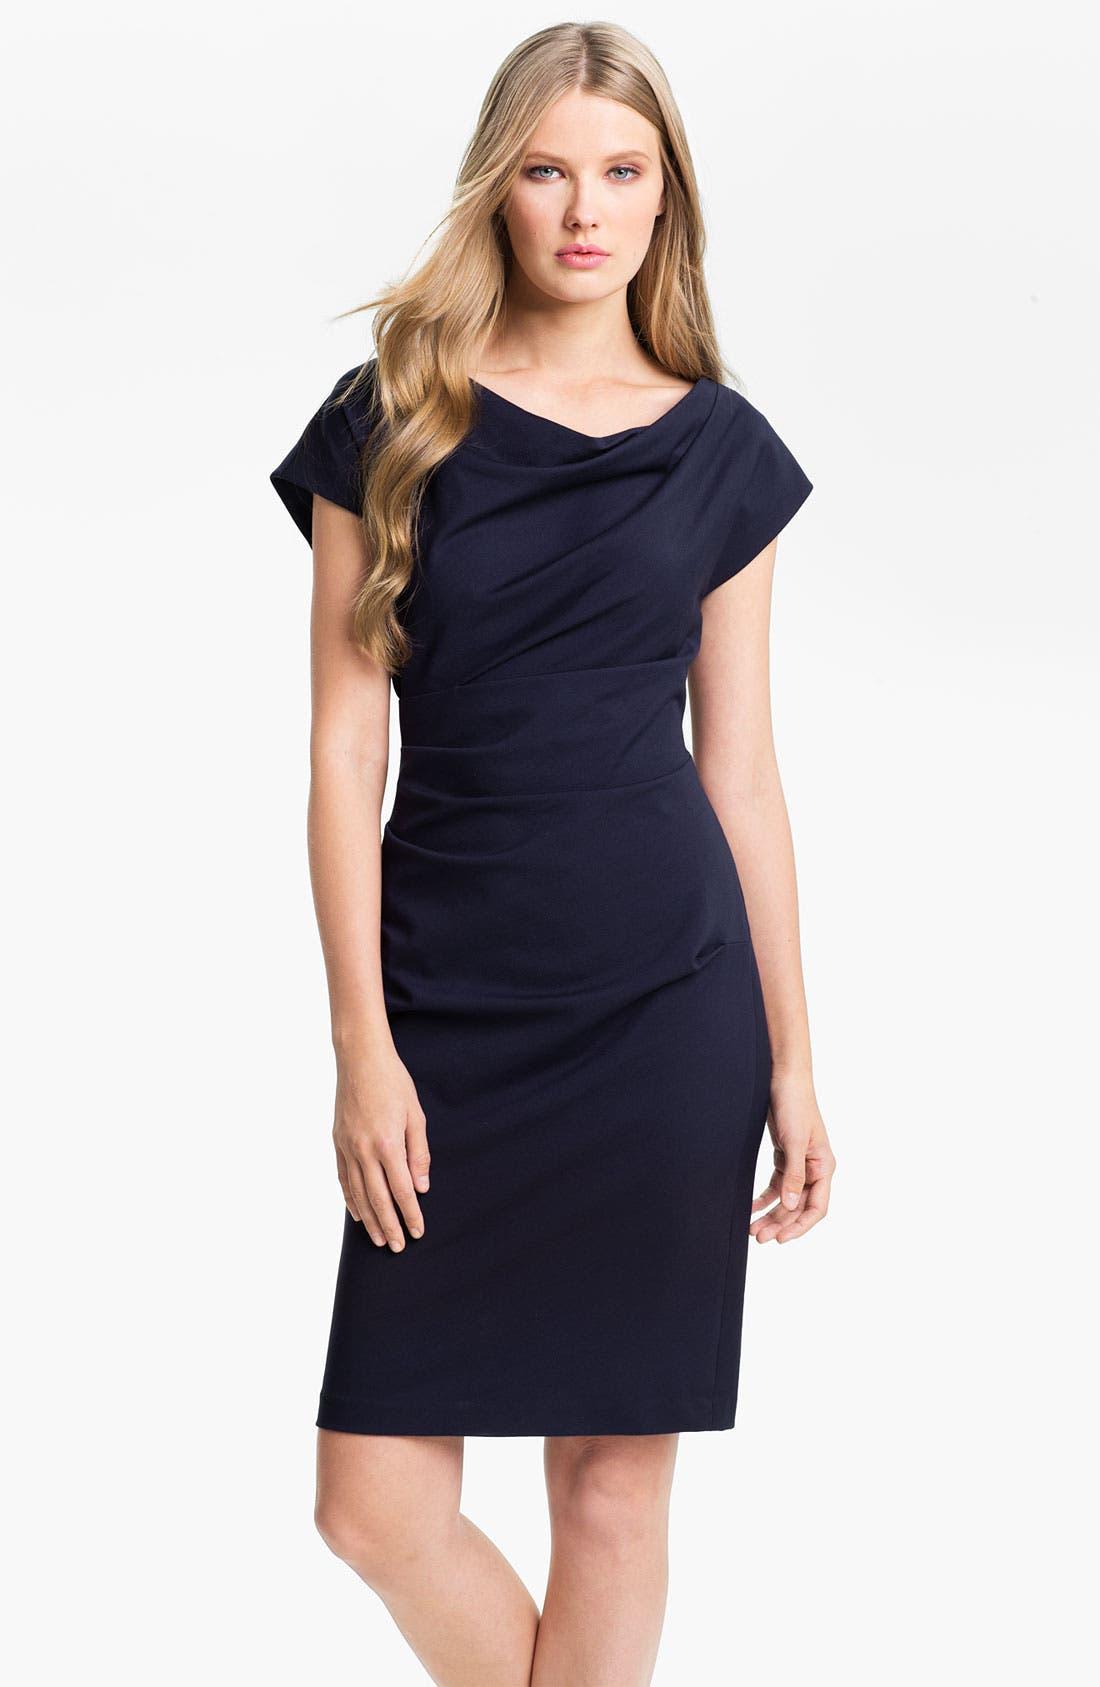 Main Image - Suzi Chin for Maggy Boutique Draped Neck Sheath Dress